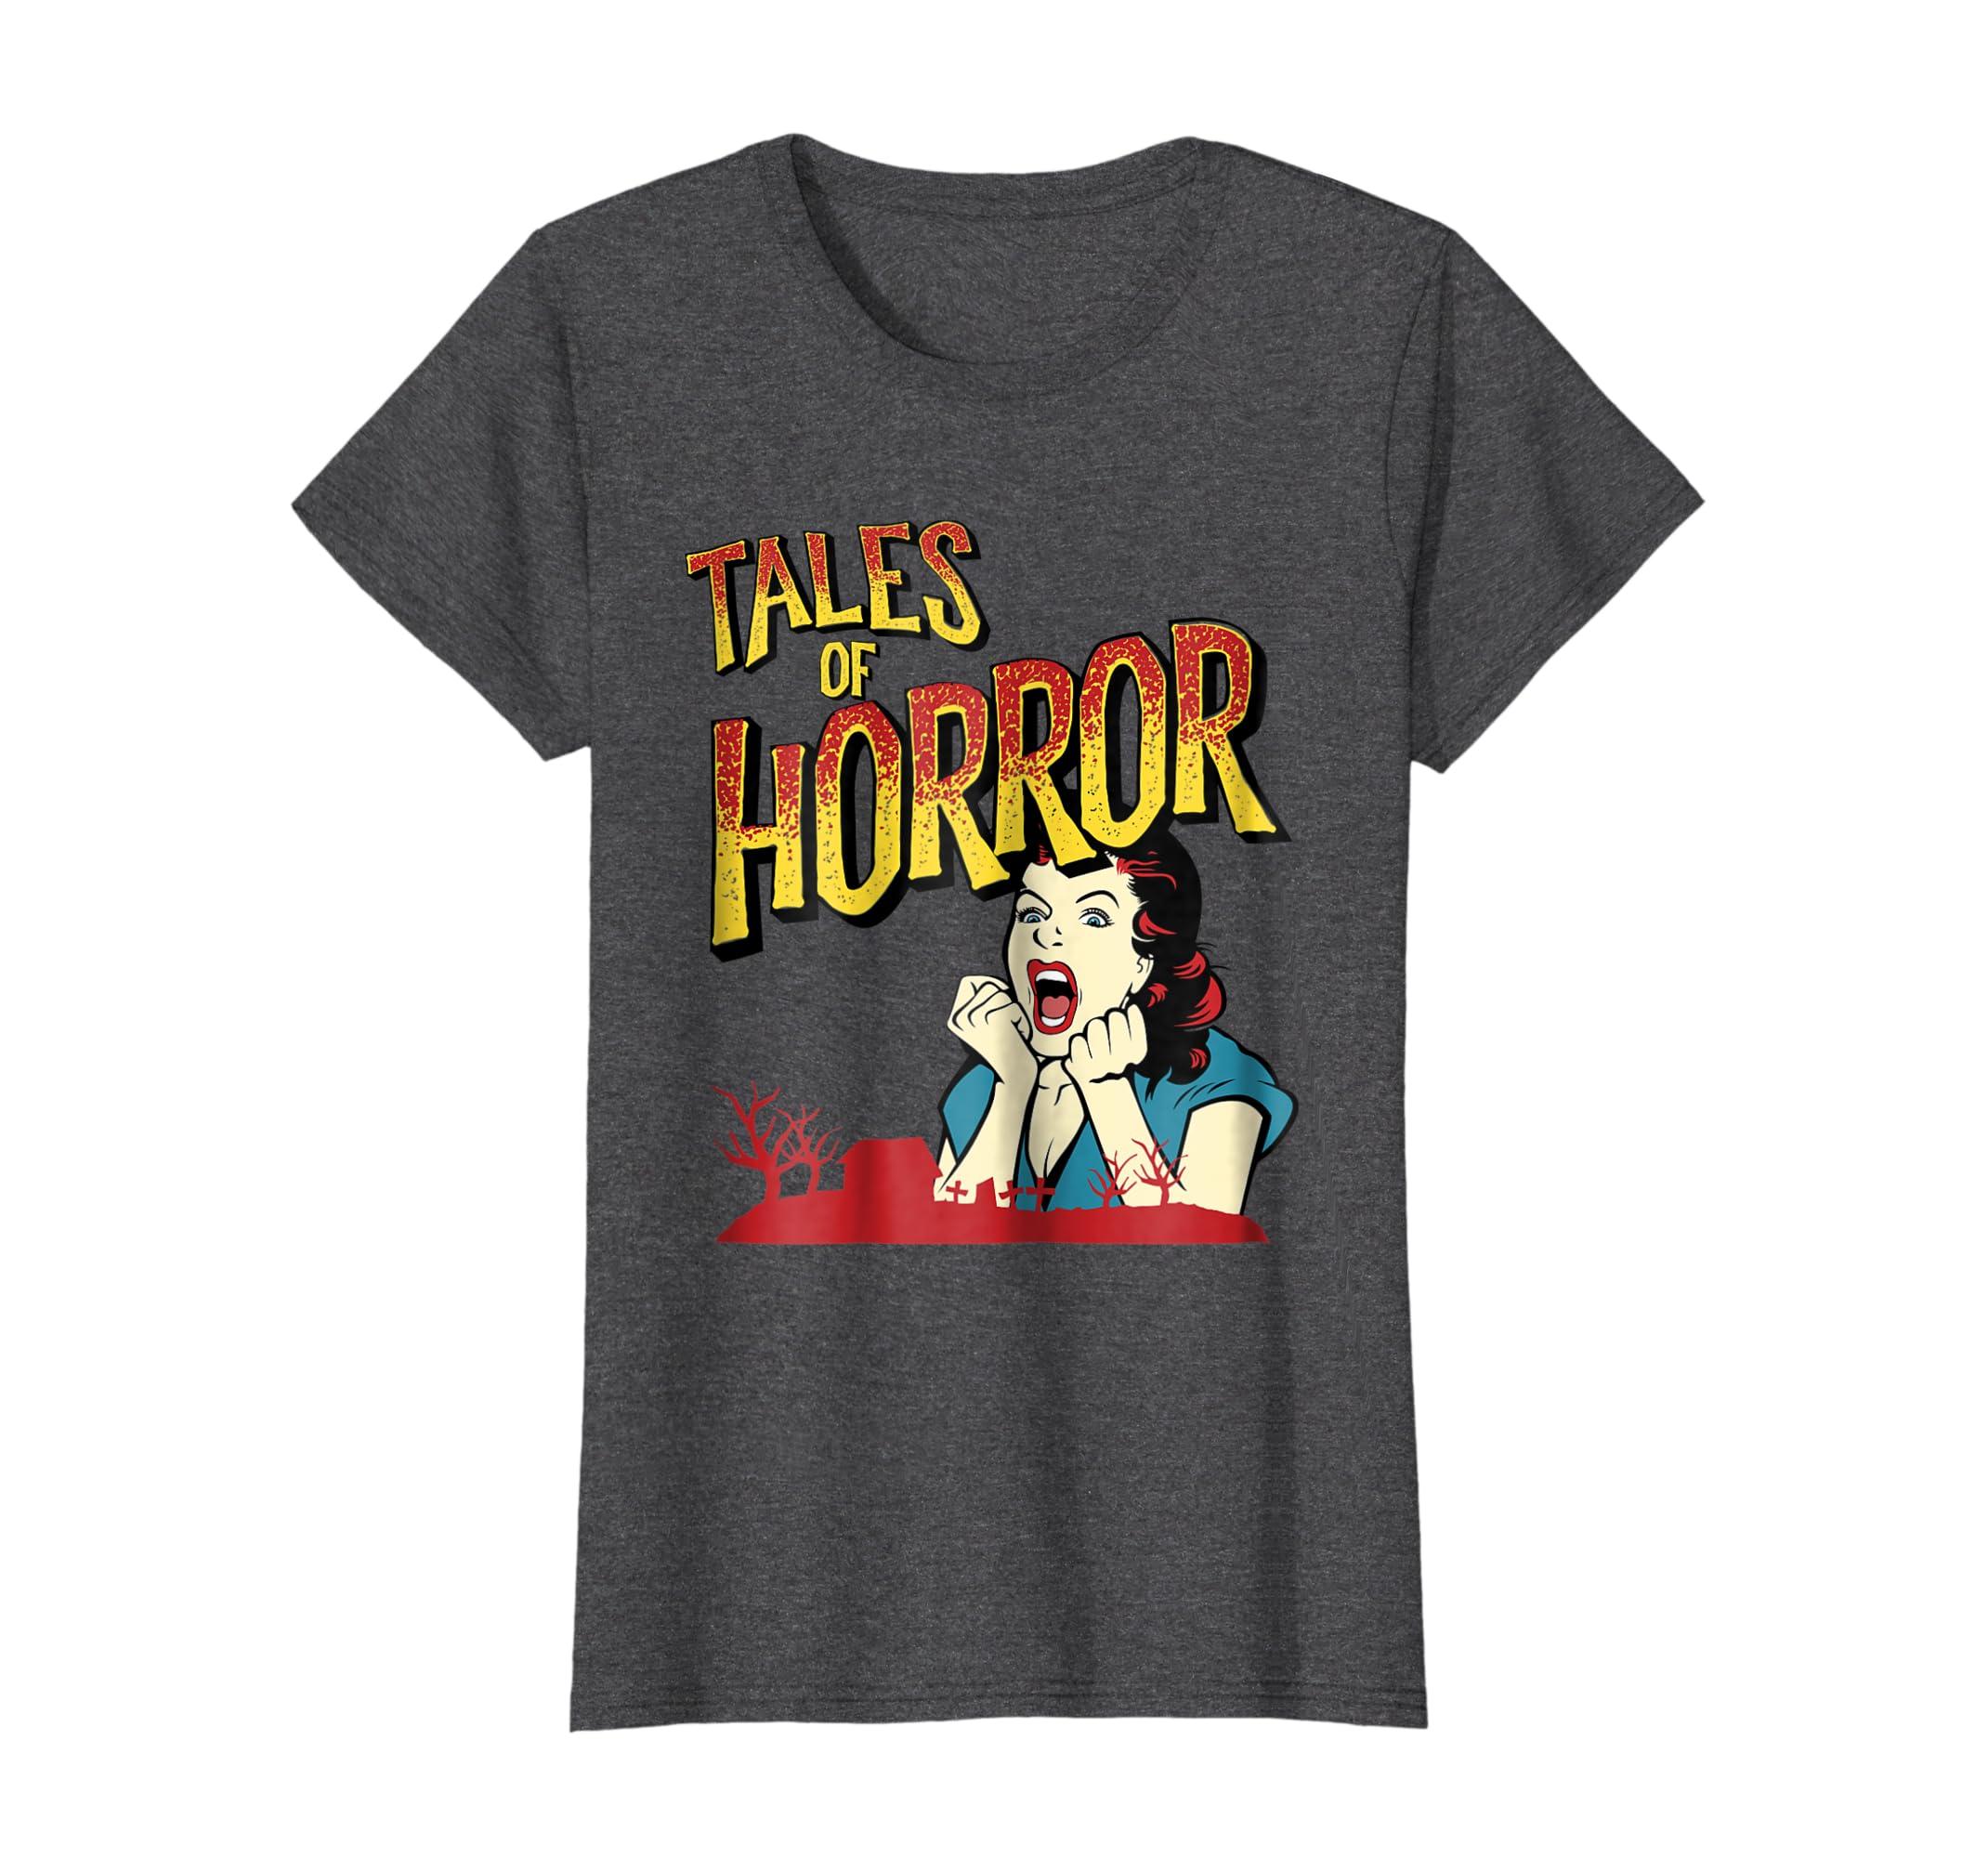 f40a5e2e1f03 Amazon.com: Vintage Horror Movie Poster Shirt Funny Halloween Shirt:  Clothing